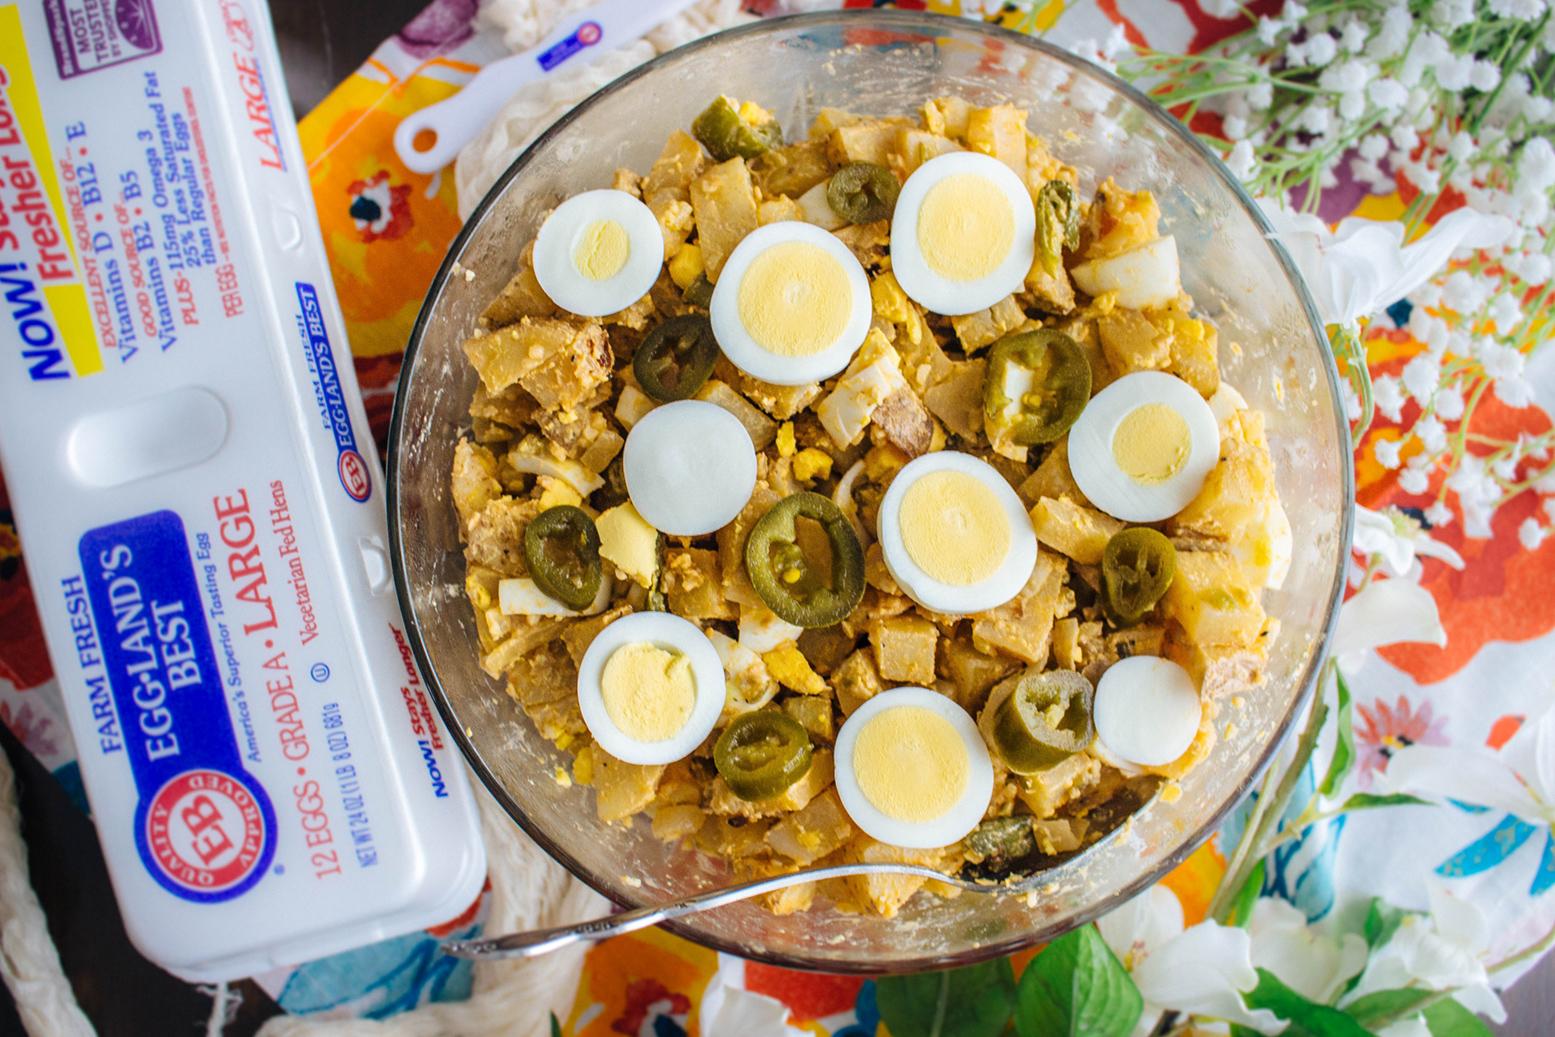 Spicy Roasted Potato Salad